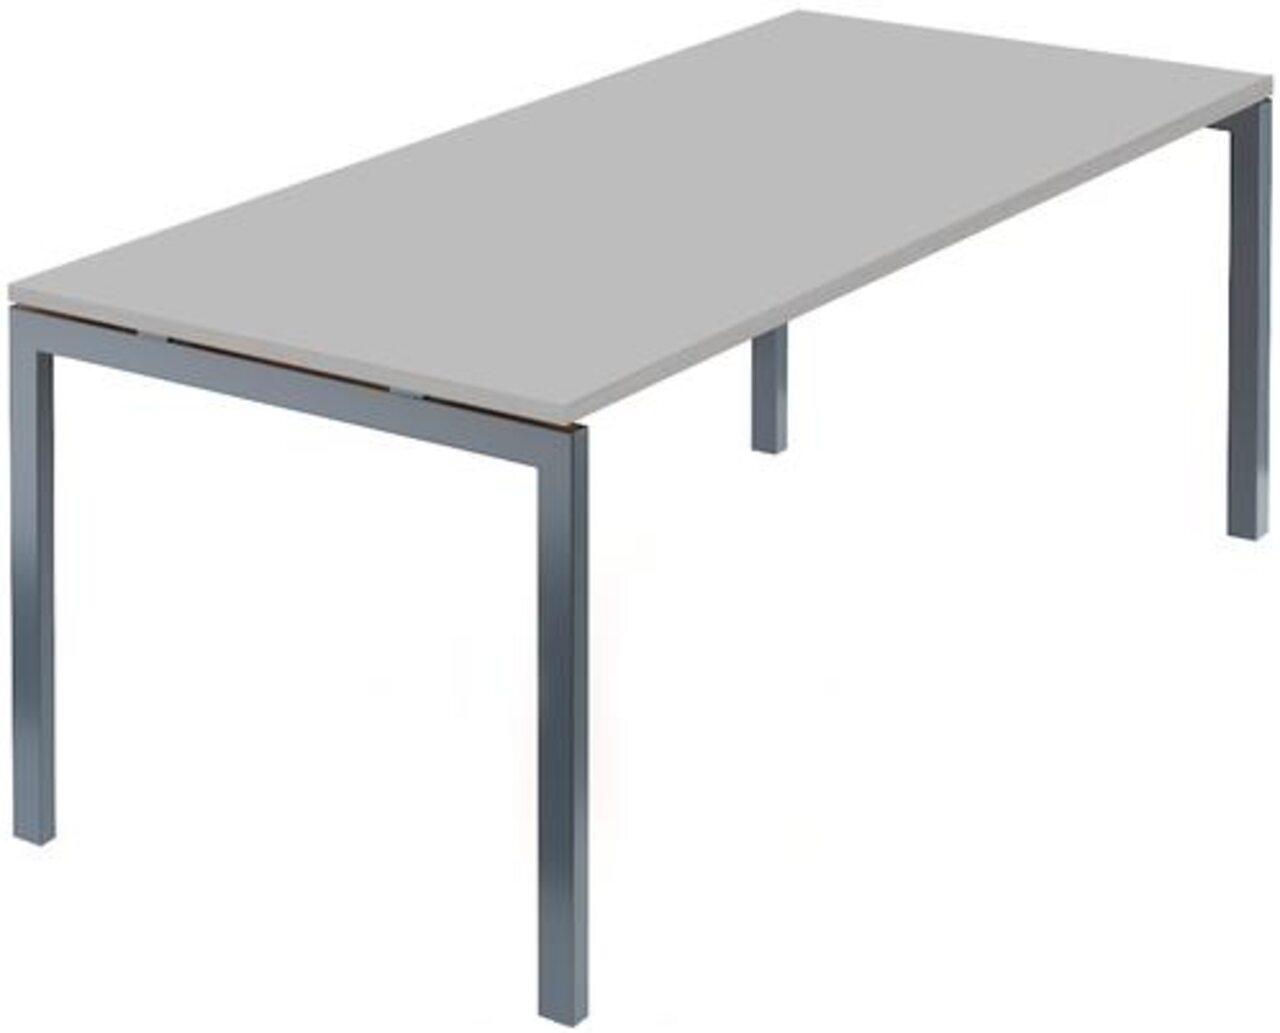 Стол на м/каркасе для заседаний/антрацит Арго 180x85x76 - фото 4